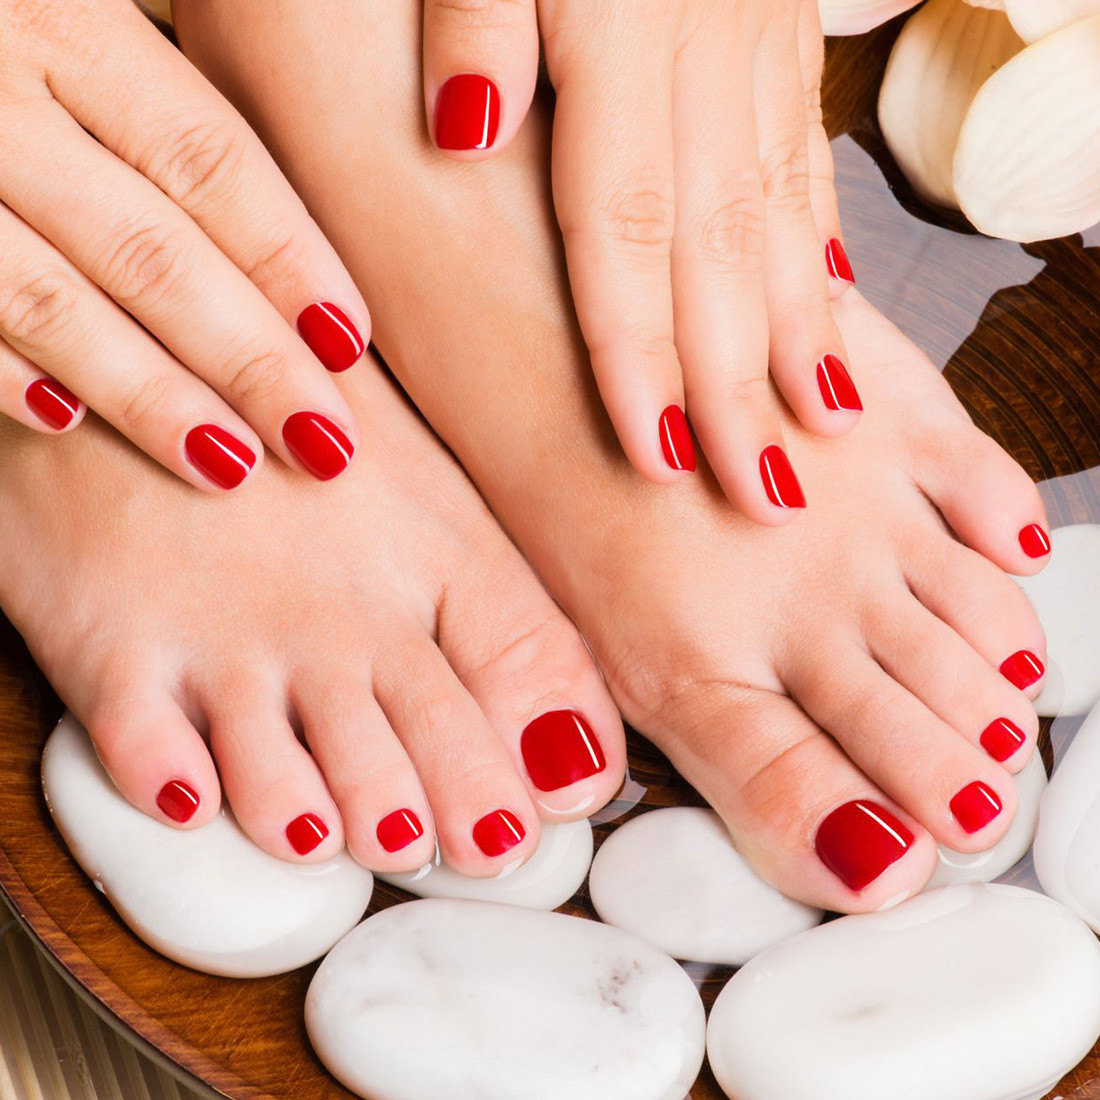 allure concept manicure pedicure 1 1100×1100